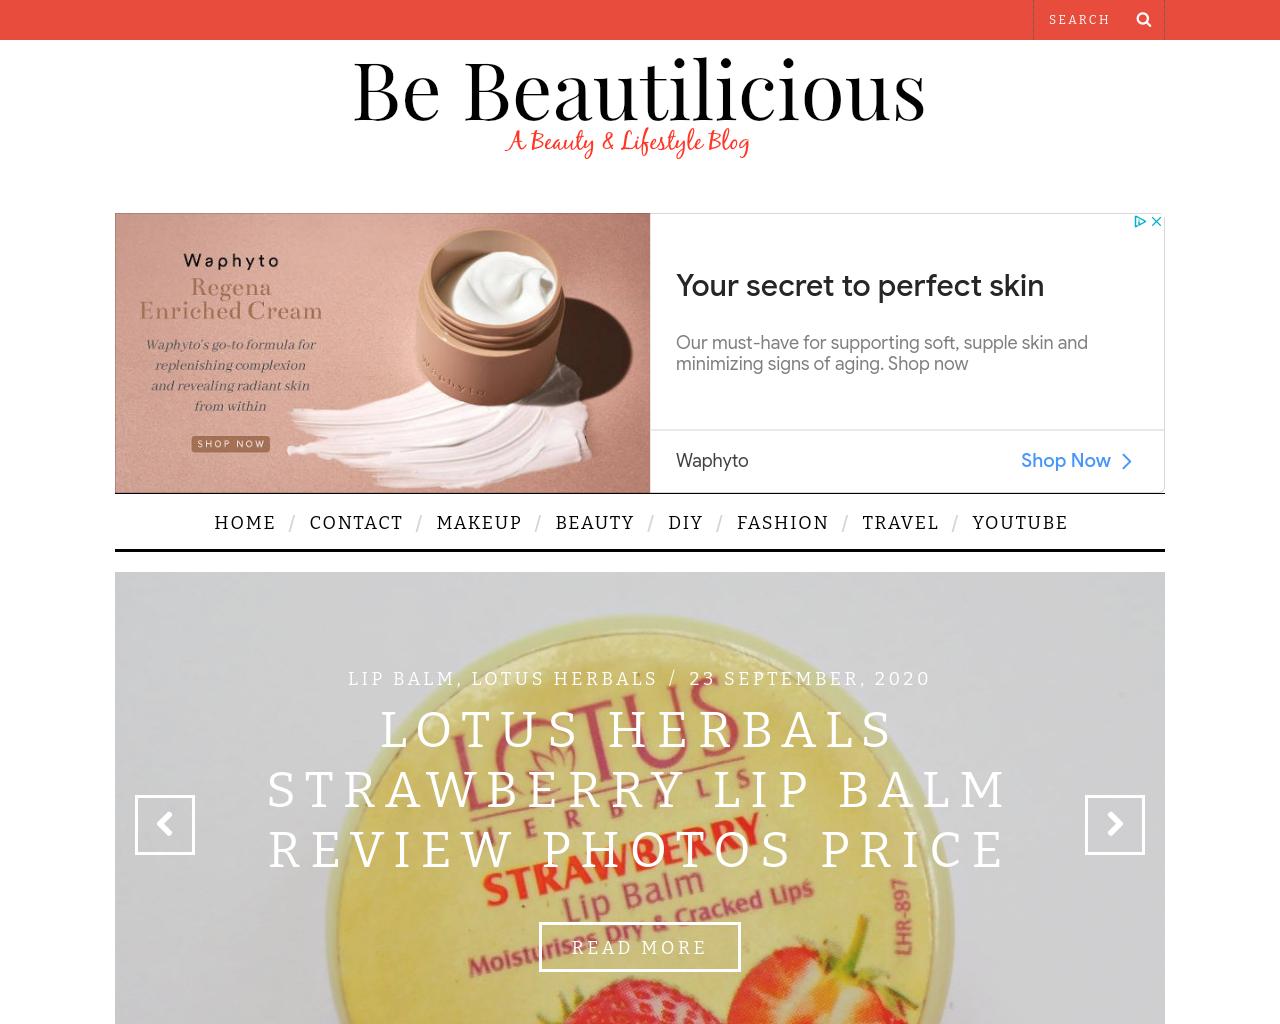 Be Beautilicious